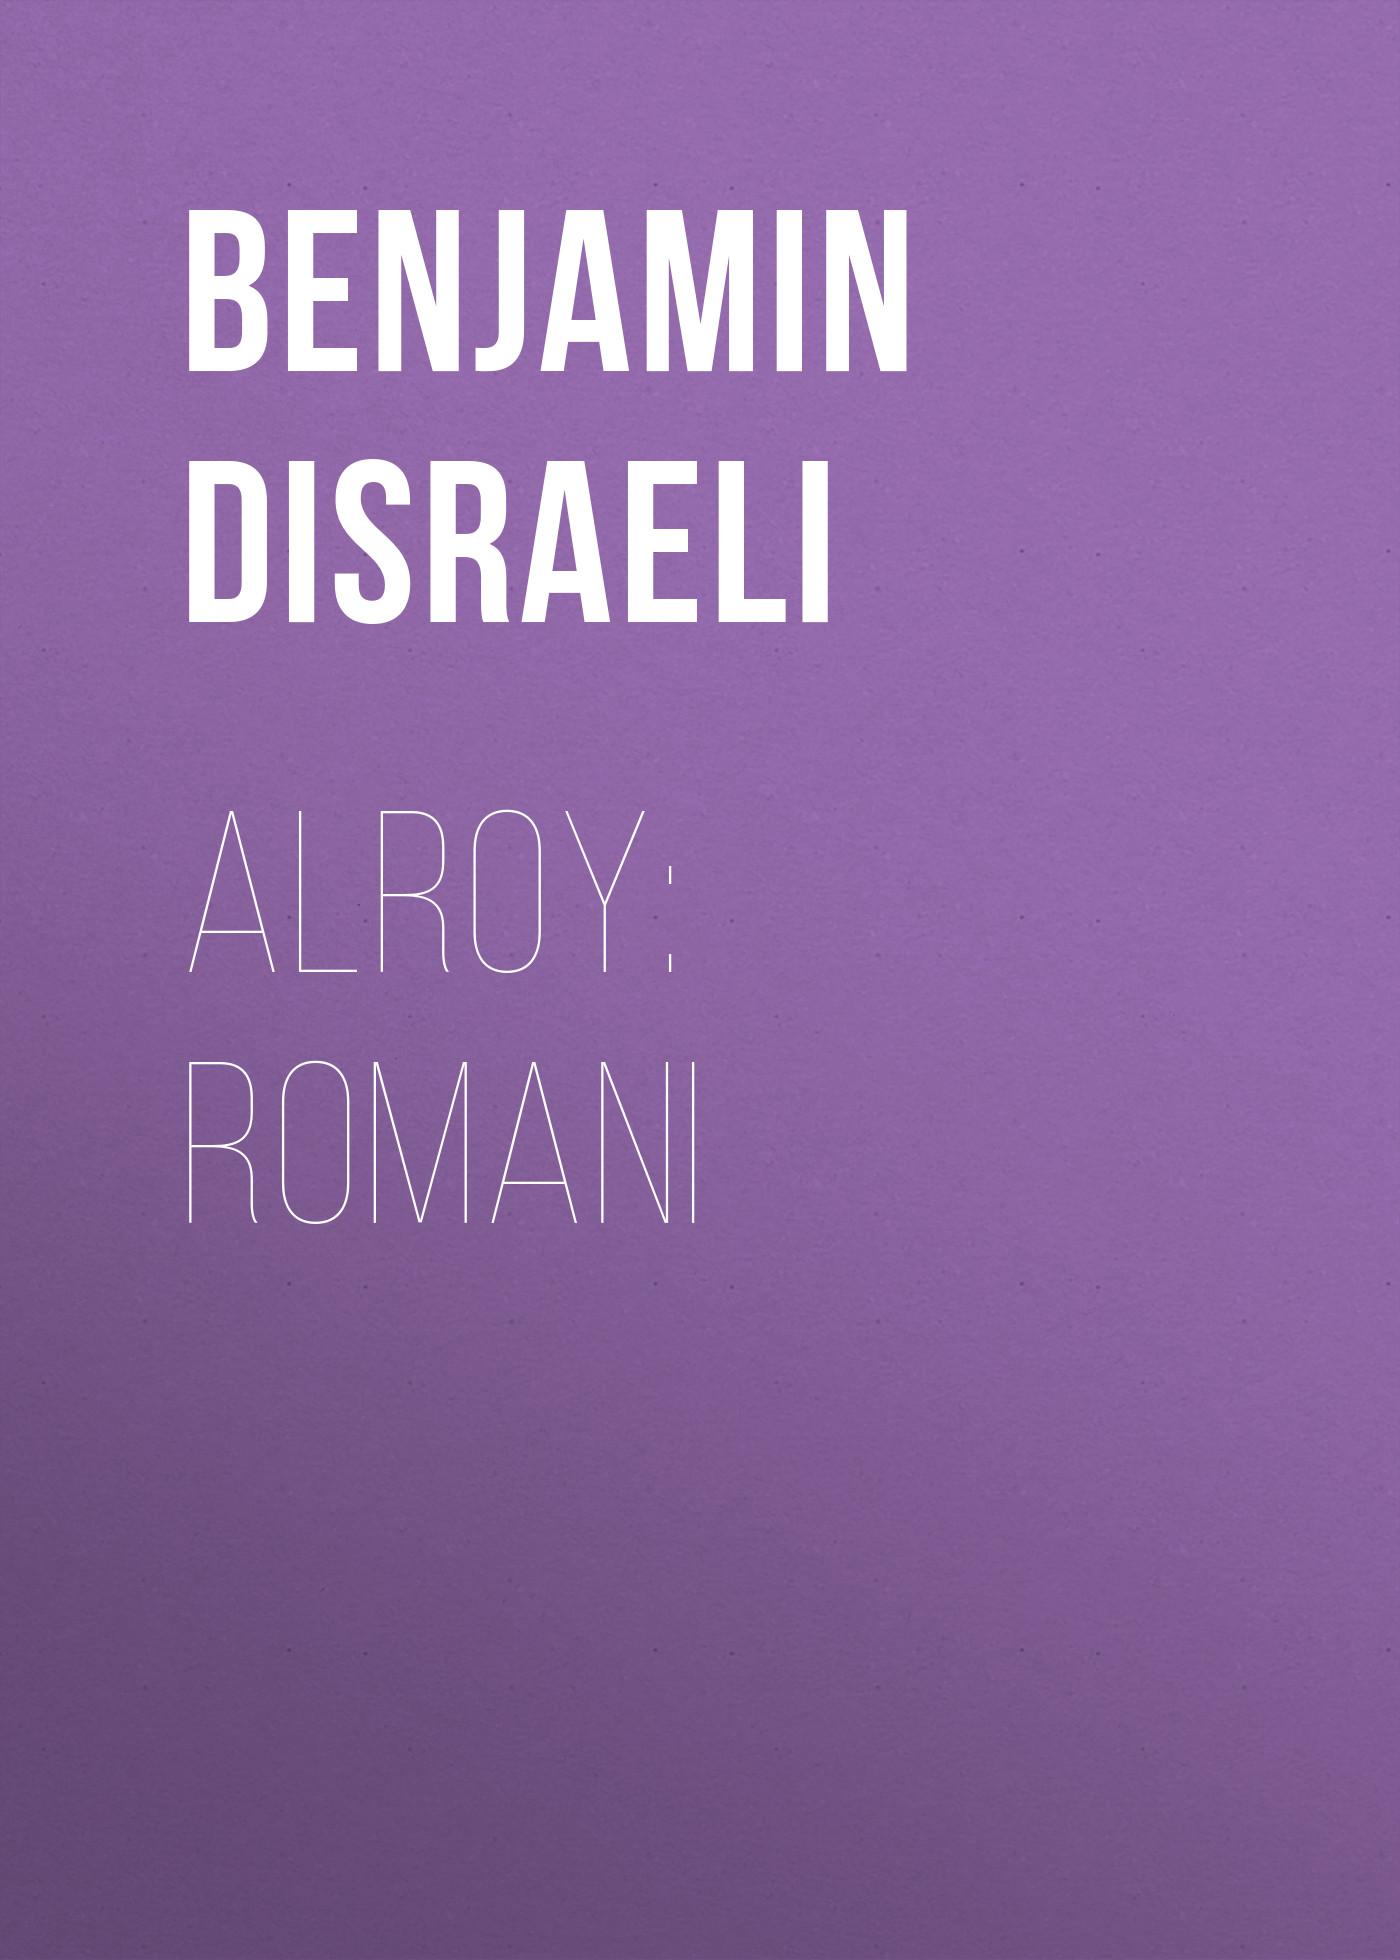 Alroy: Romani